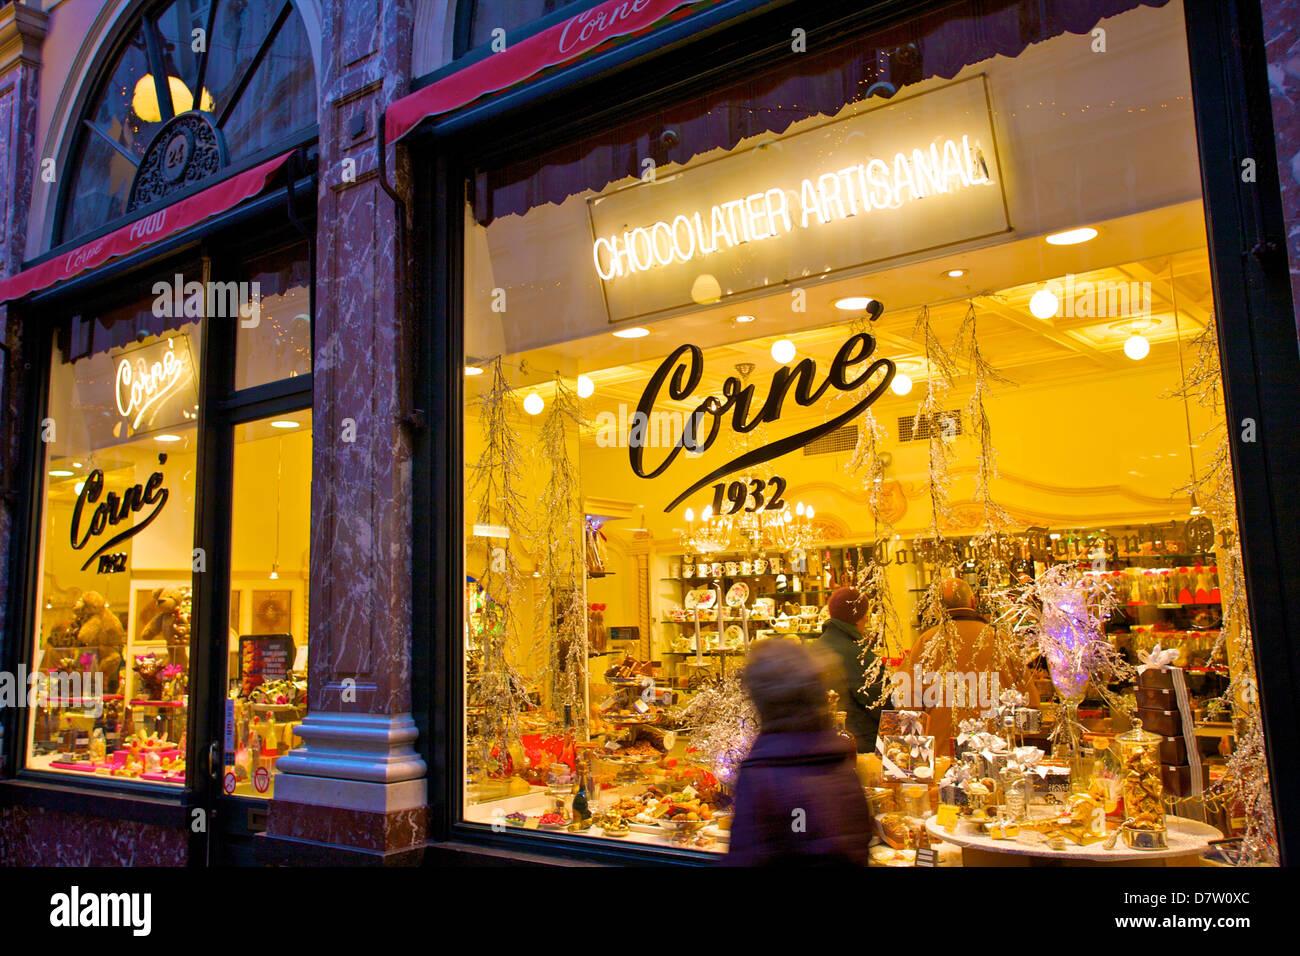 Chocolate Shop, Galleries St. Hubert, Brussels, Belgium - Stock Image